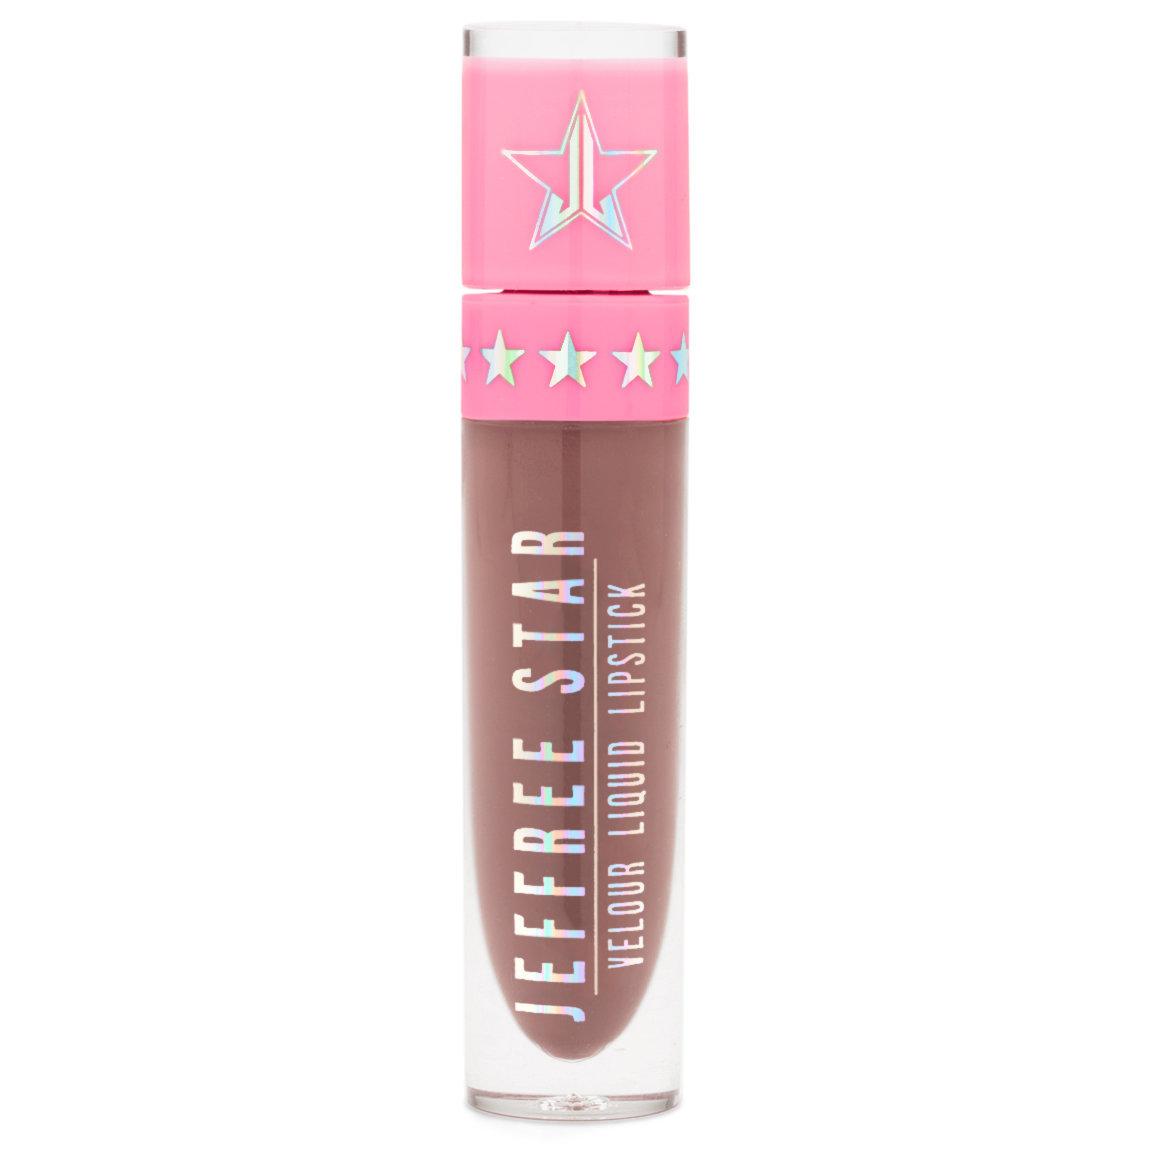 Jeffree Star Cosmetics Velour Liquid Lipstick Delicious alternative view 1.